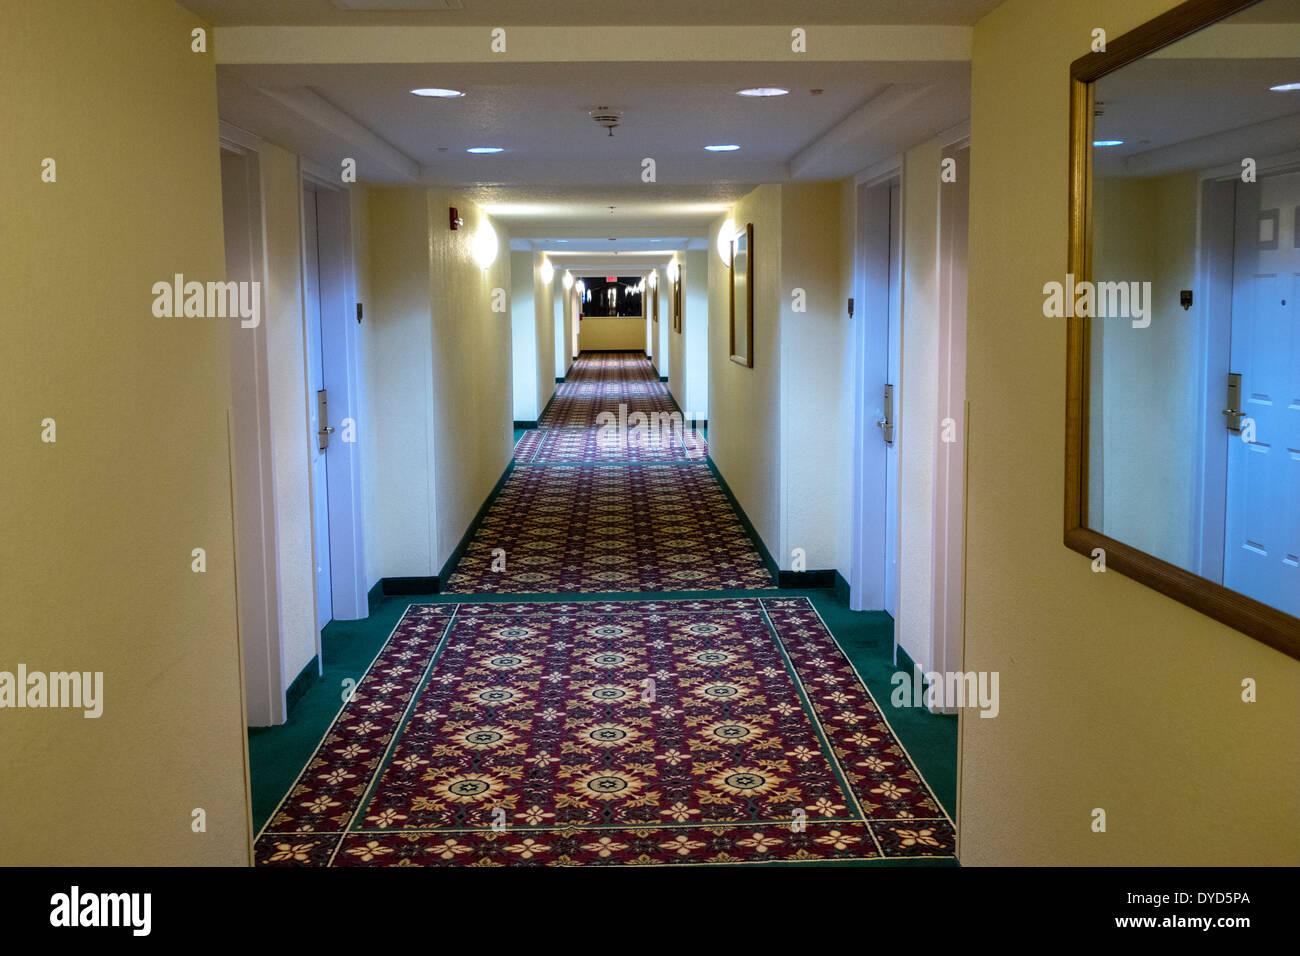 Hotel Candy Hall Orlando Florida Allure Resort International Drive Hotel Lobby